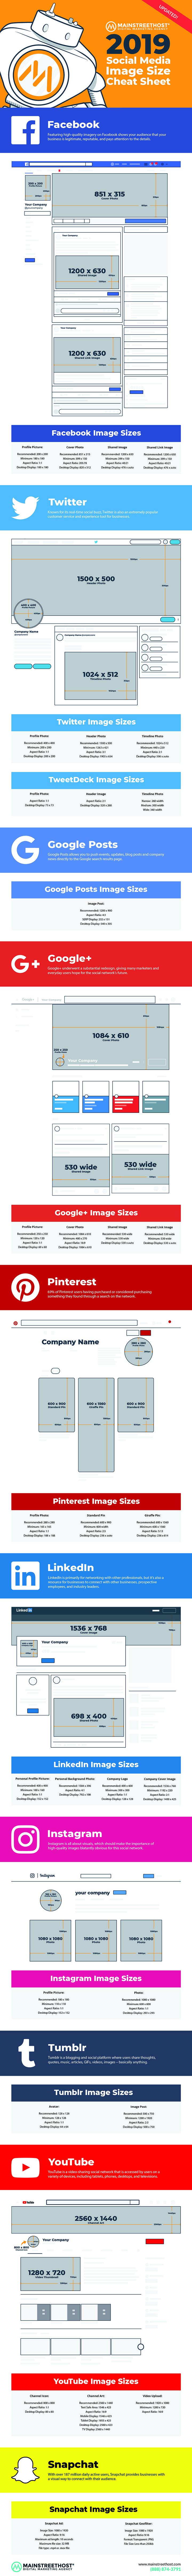 2019 Social Media Image Dimensions [Cheat Sheet]